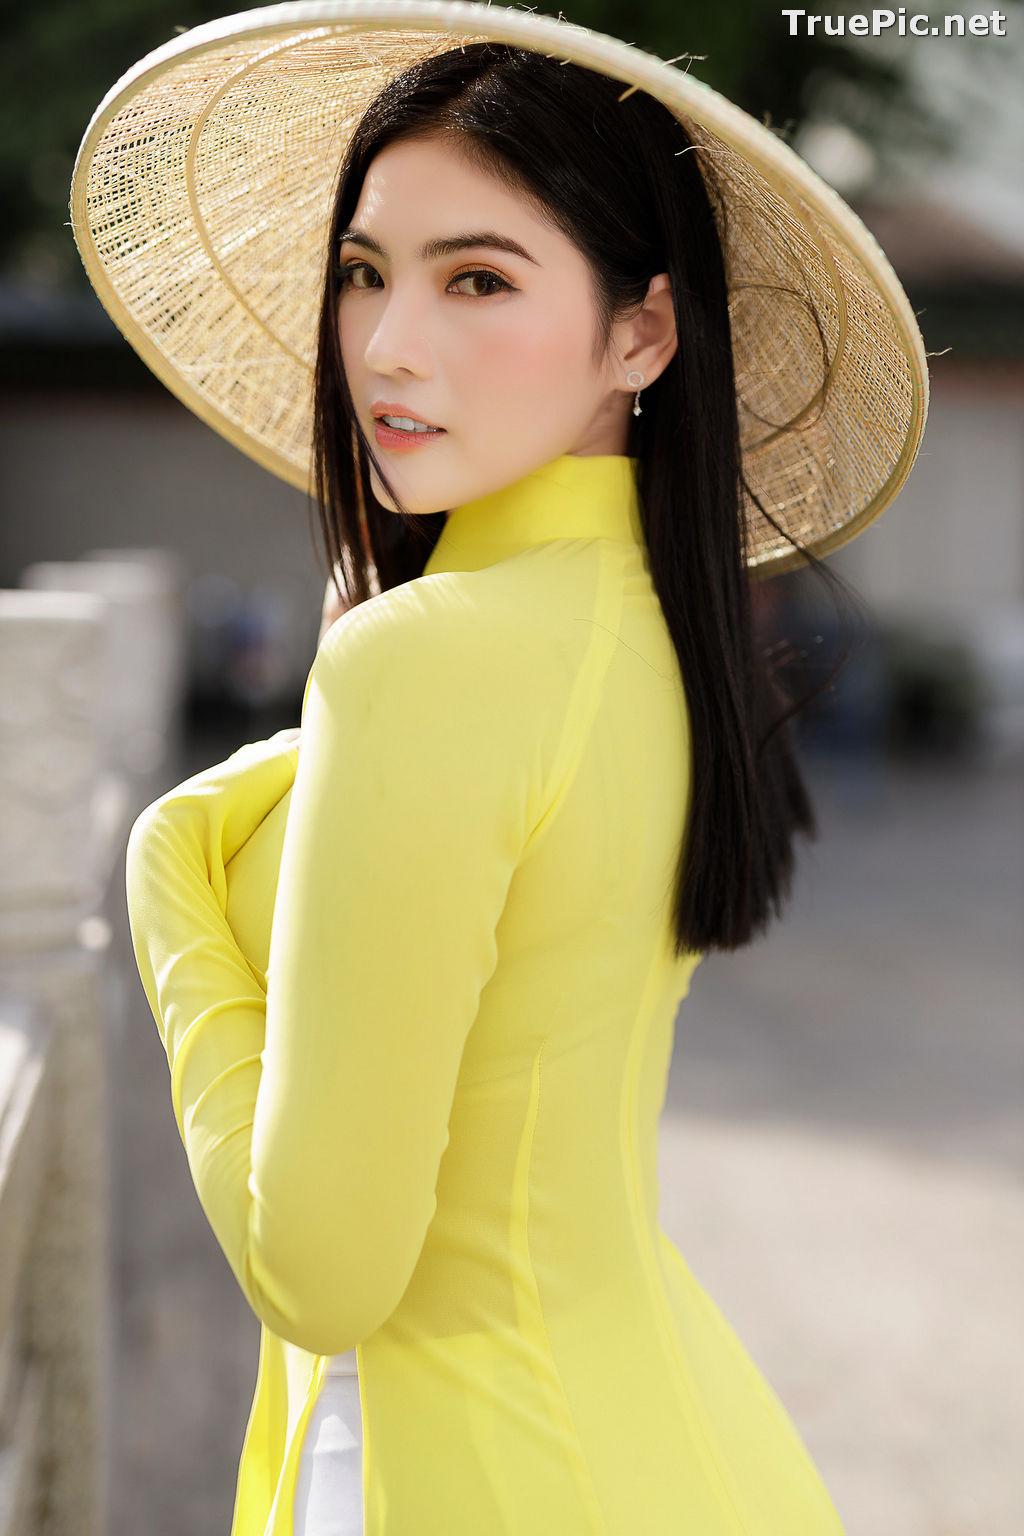 https://1.bp.blogspot.com/-h5v3dFpgHsI/Xx2dvSbWi_I/AAAAAAAA4XM/qzgB3xshnxERkek5ub8P9MrOyF1swn4QACLcBGAsYHQ/s1600/The-Beauty-of-Vietnamese-Girls-with-Traditional-Dress-Ao-Dai-2-TruePic.net%2B%252848%2529.jpg